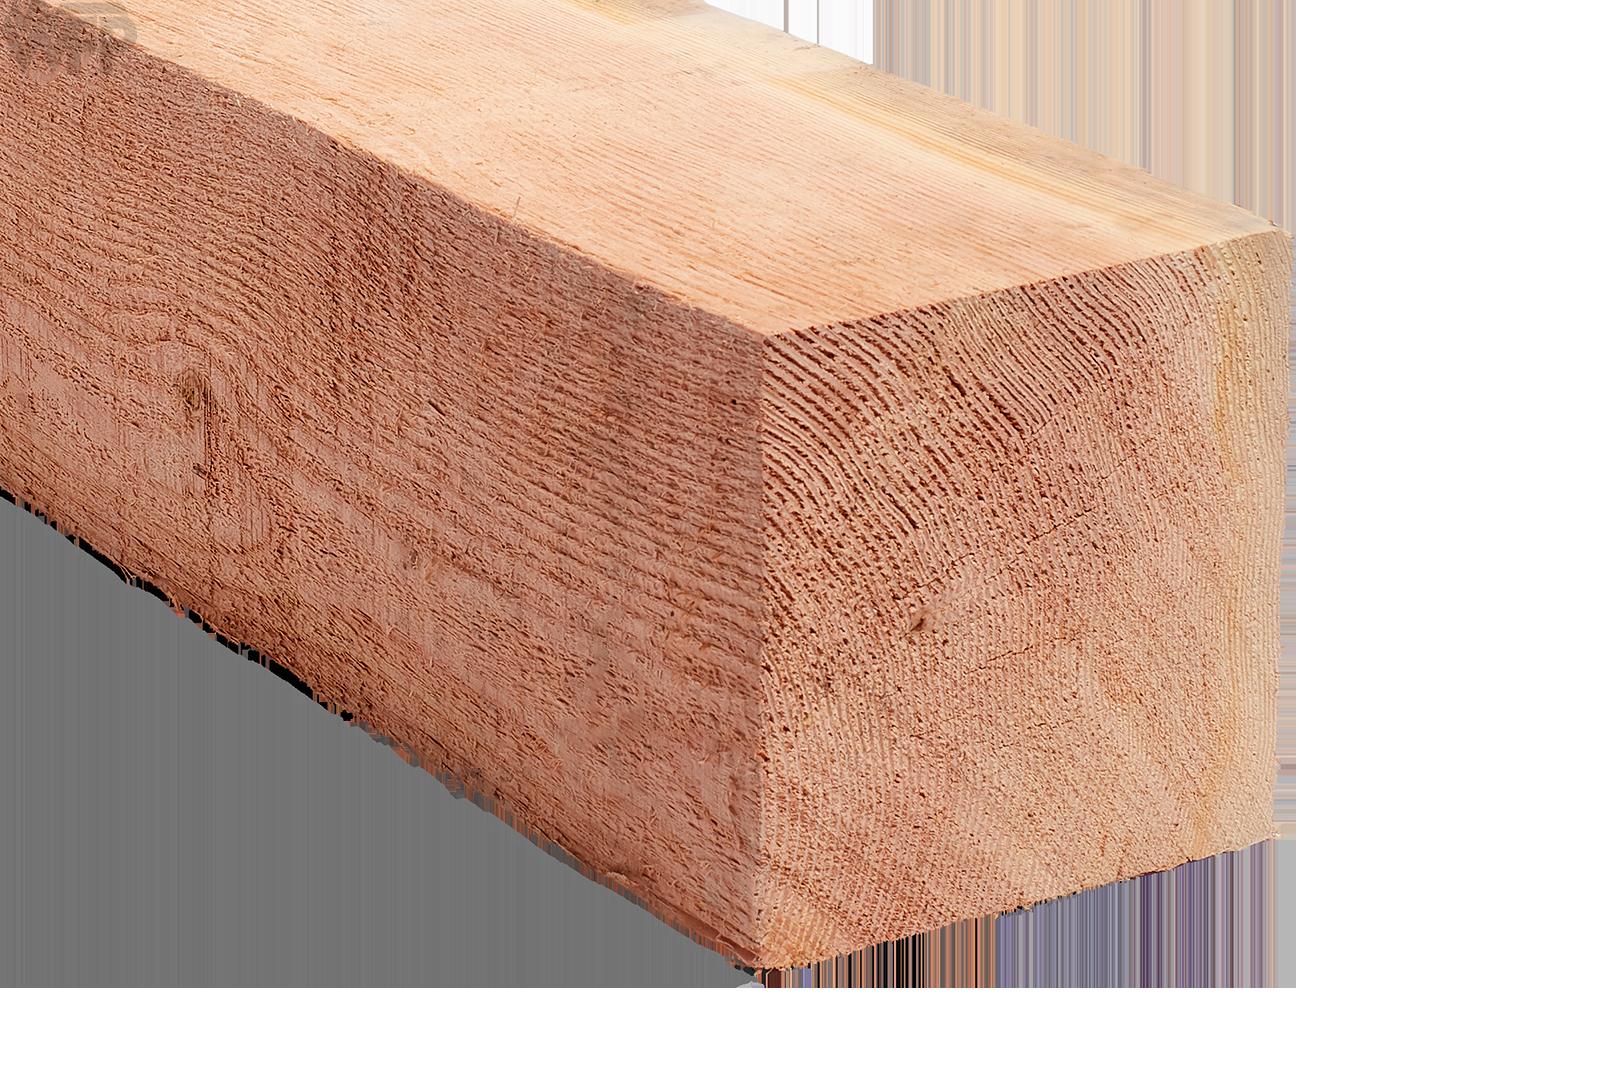 WFP_SRC_DF-Timber-FOHC_6x6_0006-1